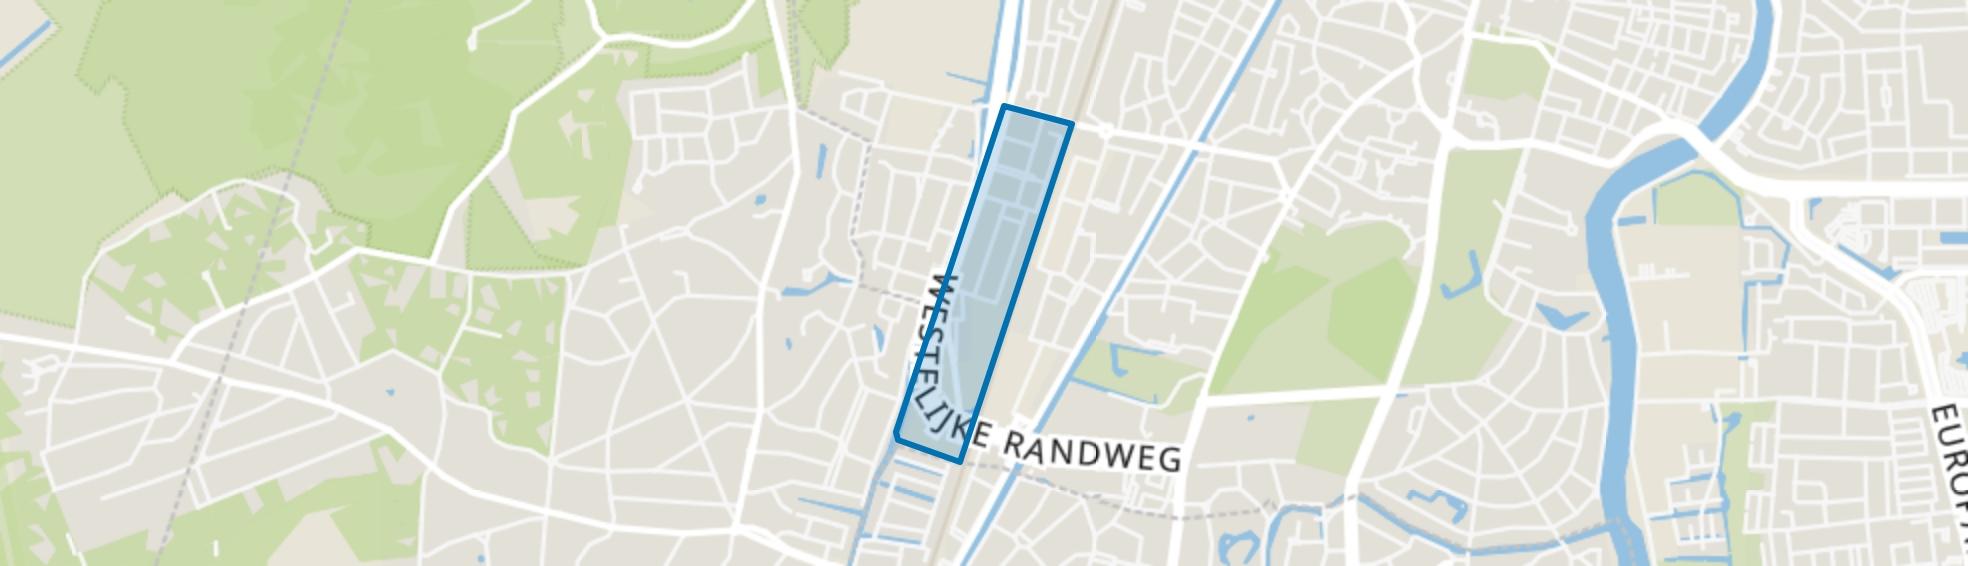 Natuurkundigenbuurt-west, Haarlem map